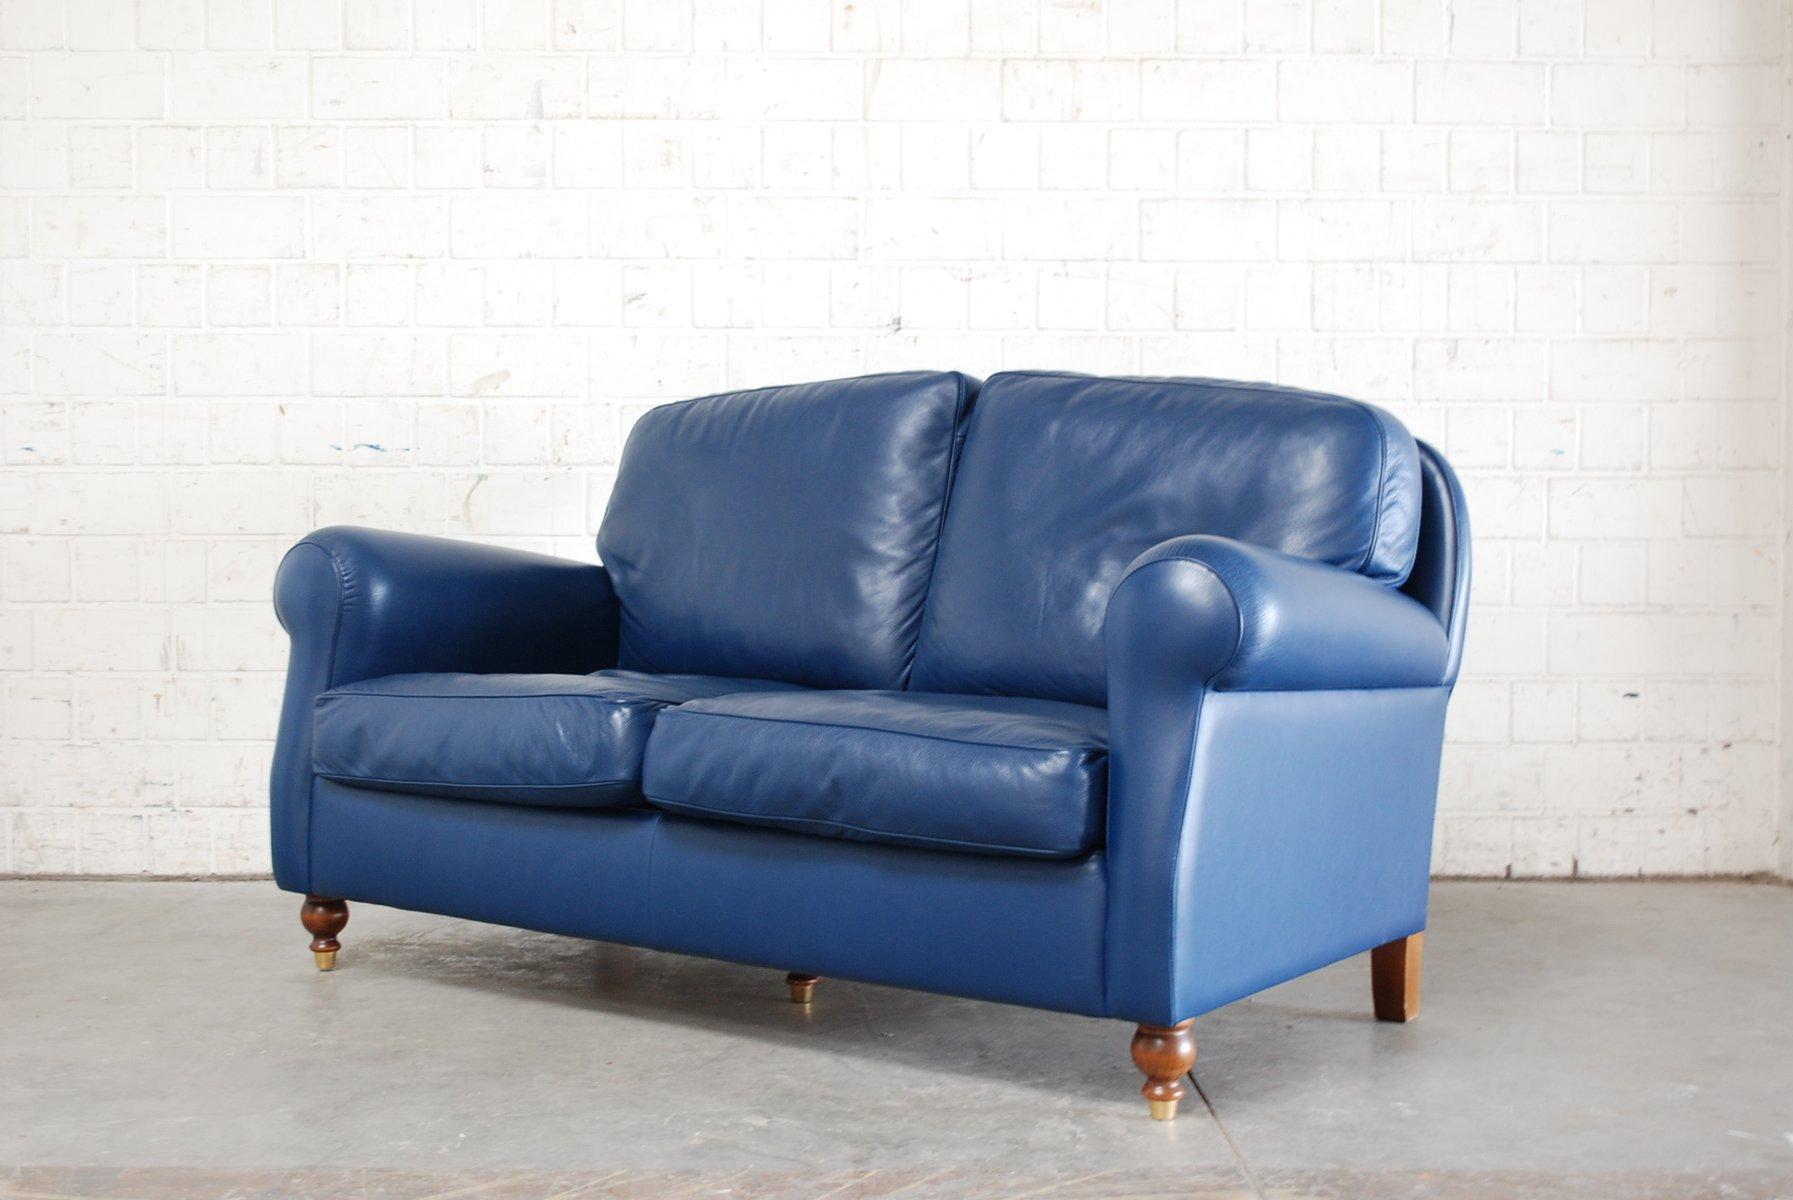 Blue Leather George Sofa From Poltrona Frau, 1999